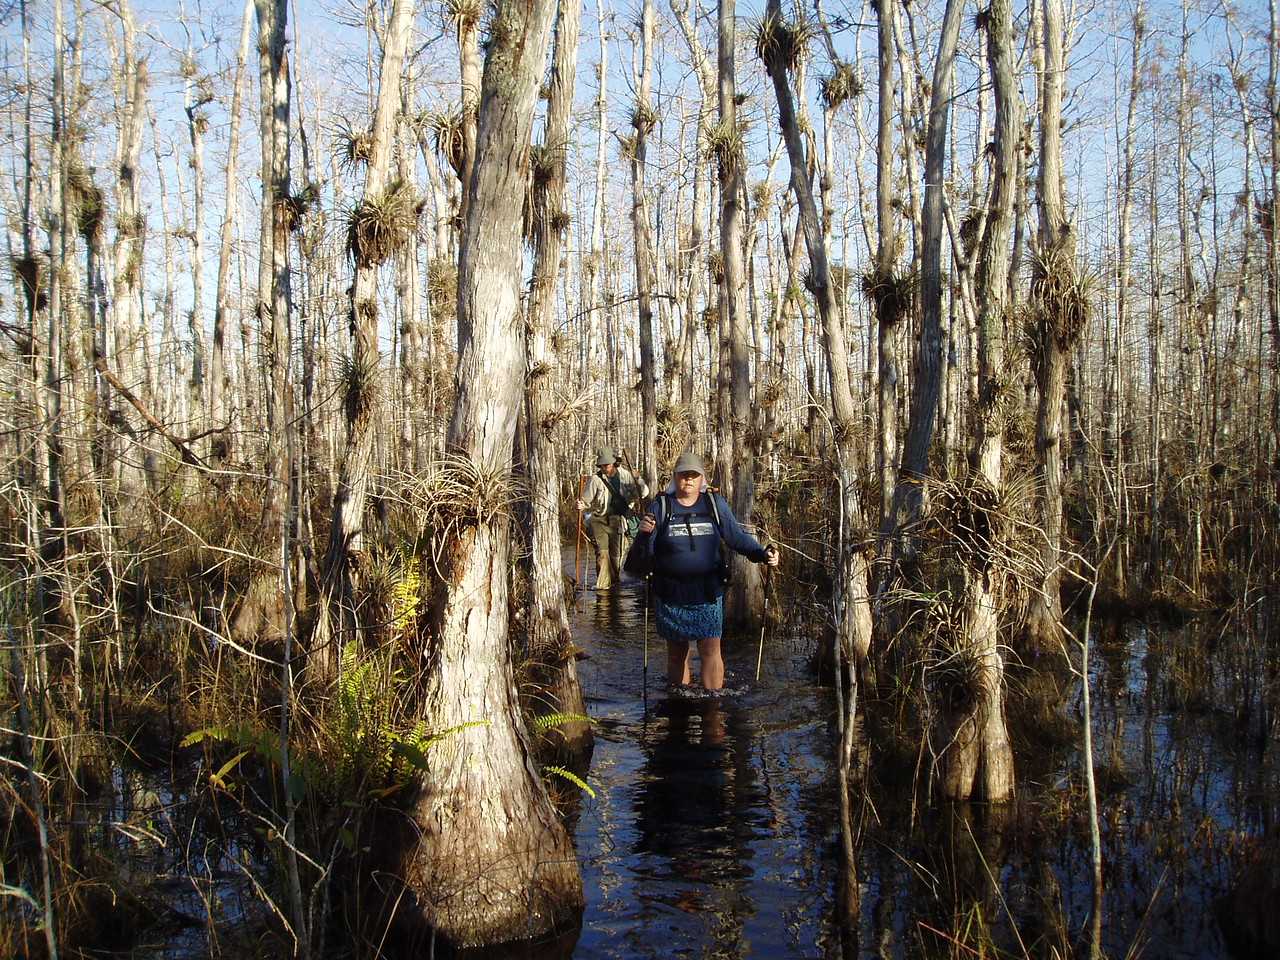 Backpacking Big Cypress<br /> location: Big Cypress National Preserve<br /> PHOTO CREDIT: Robert Coveney / Florida Trail Association